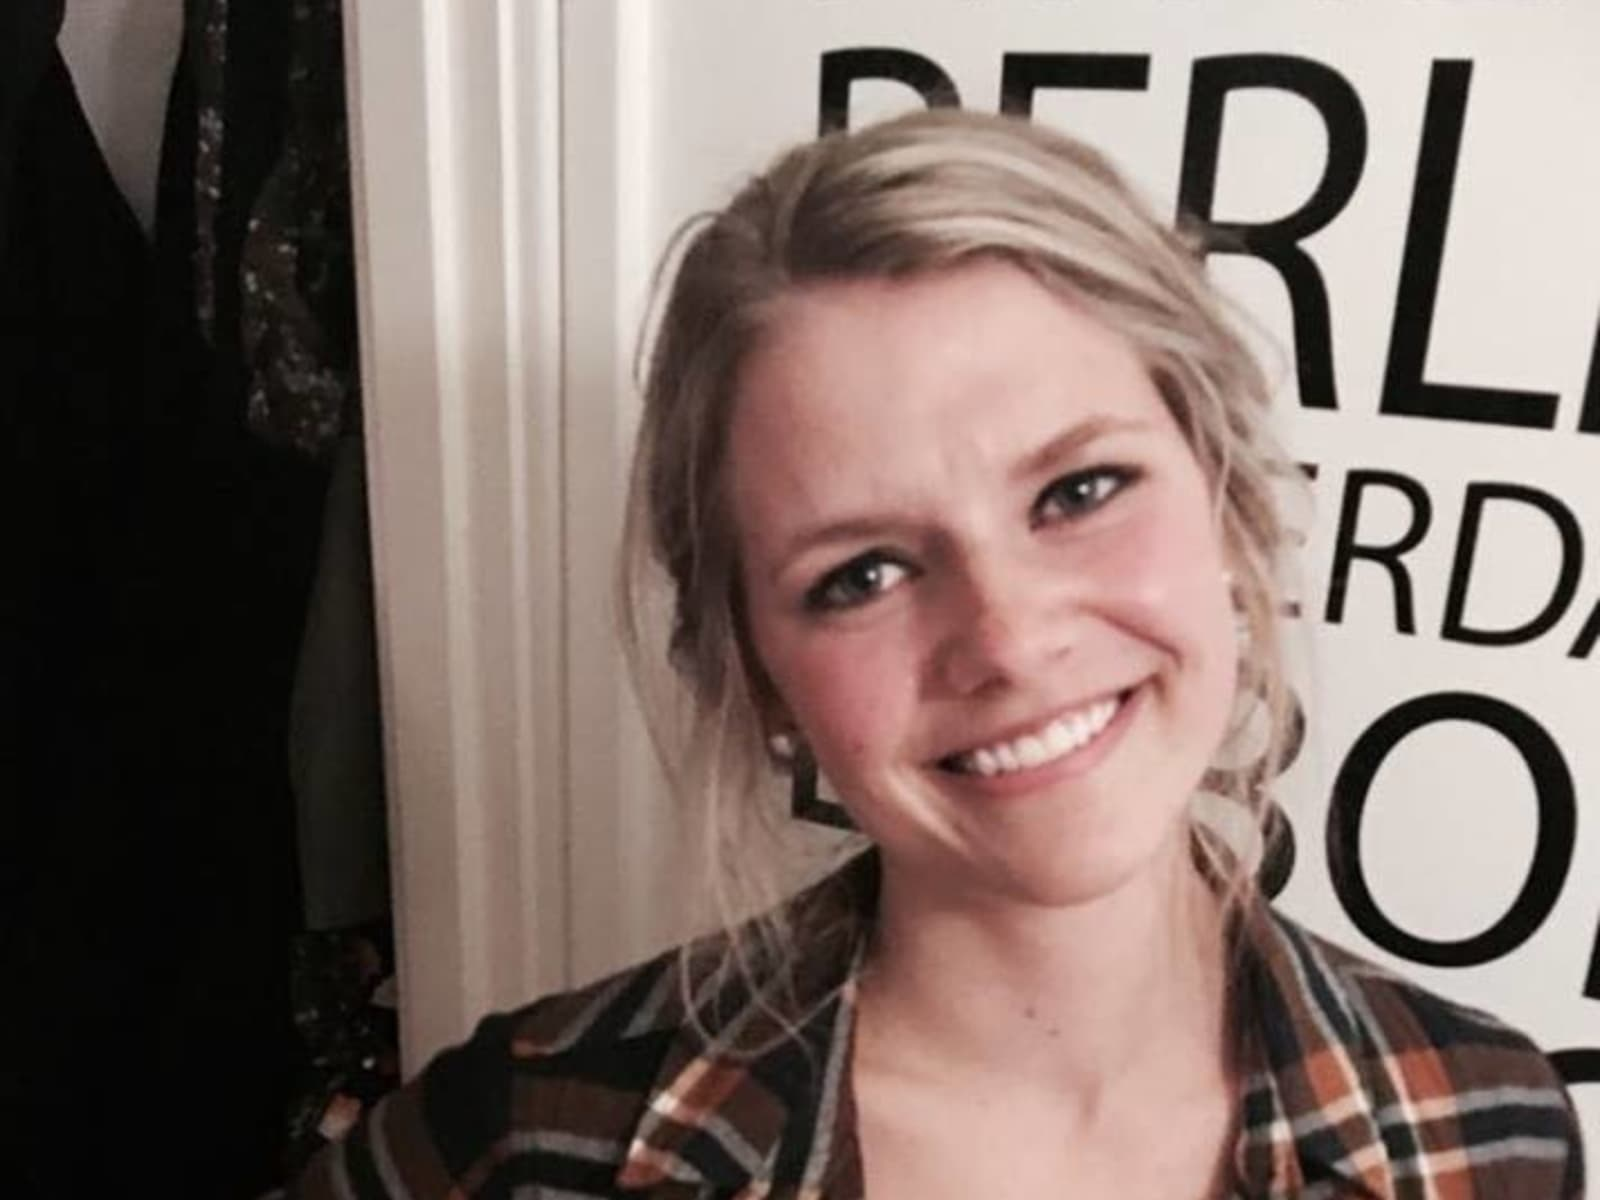 Elisabeth from Copenhagen, Denmark